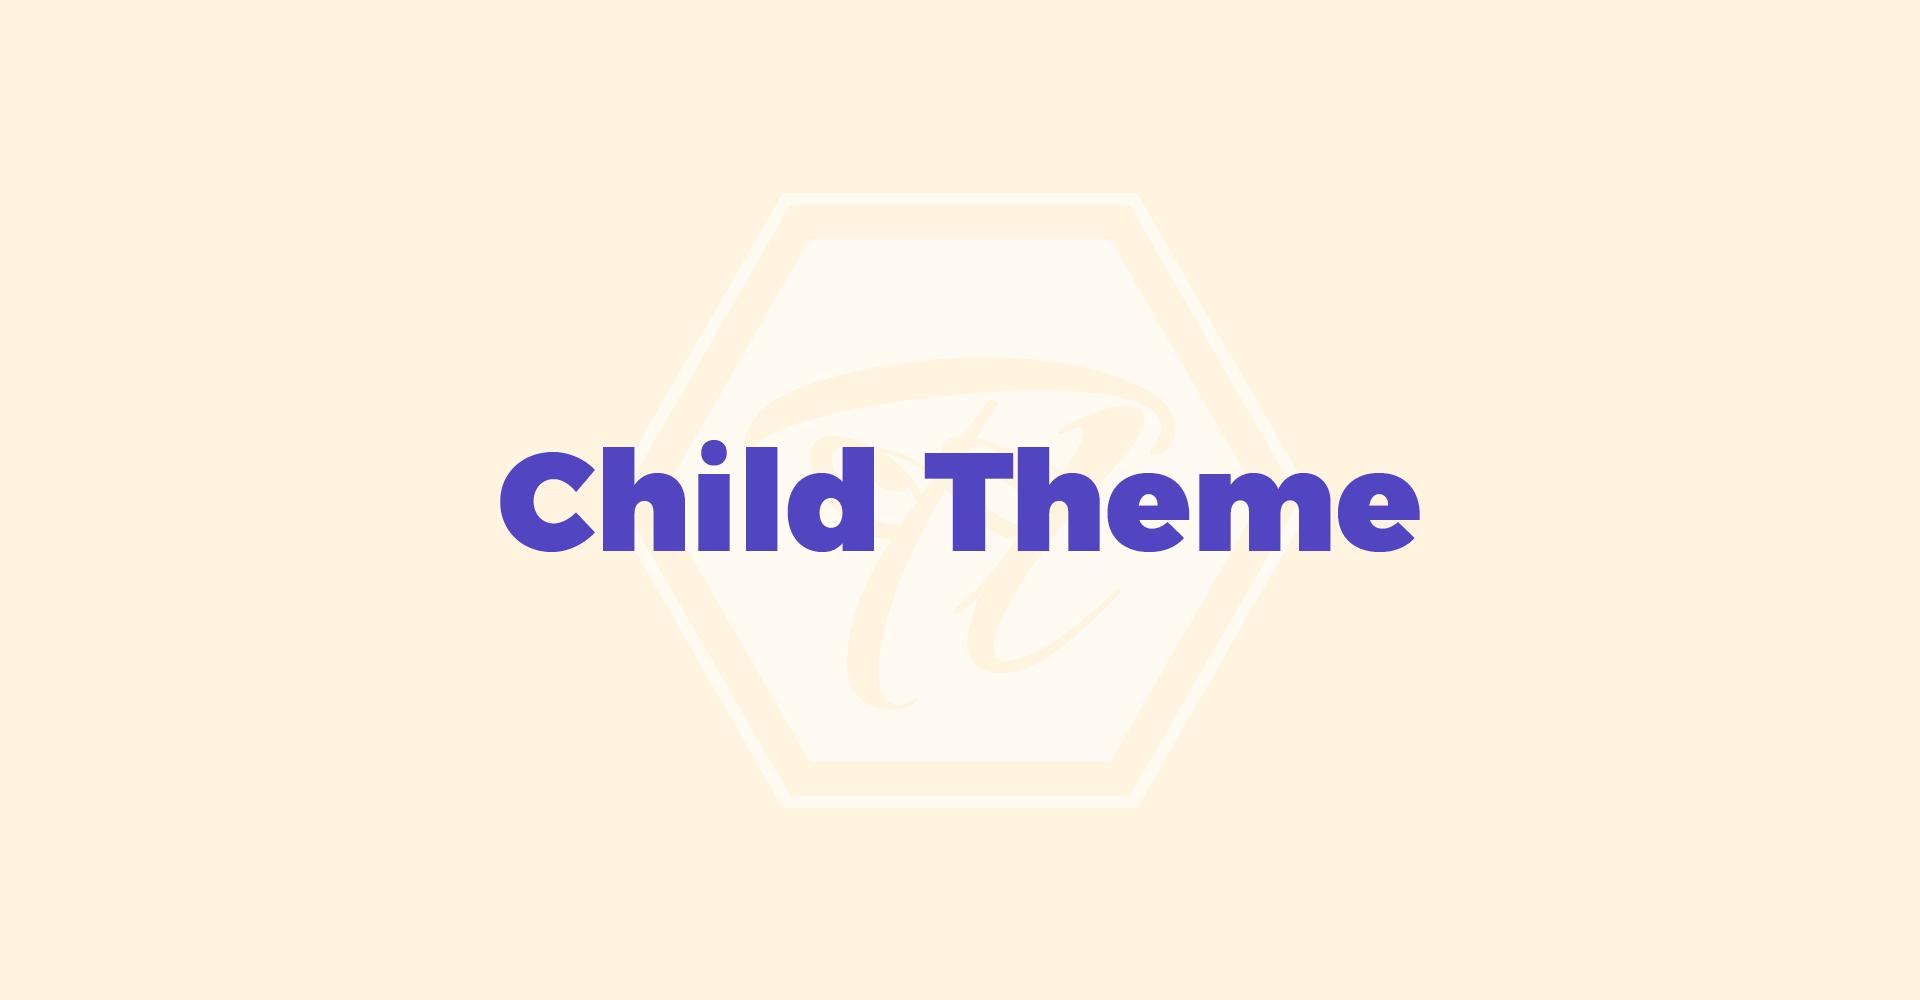 child_theme 1 1 2